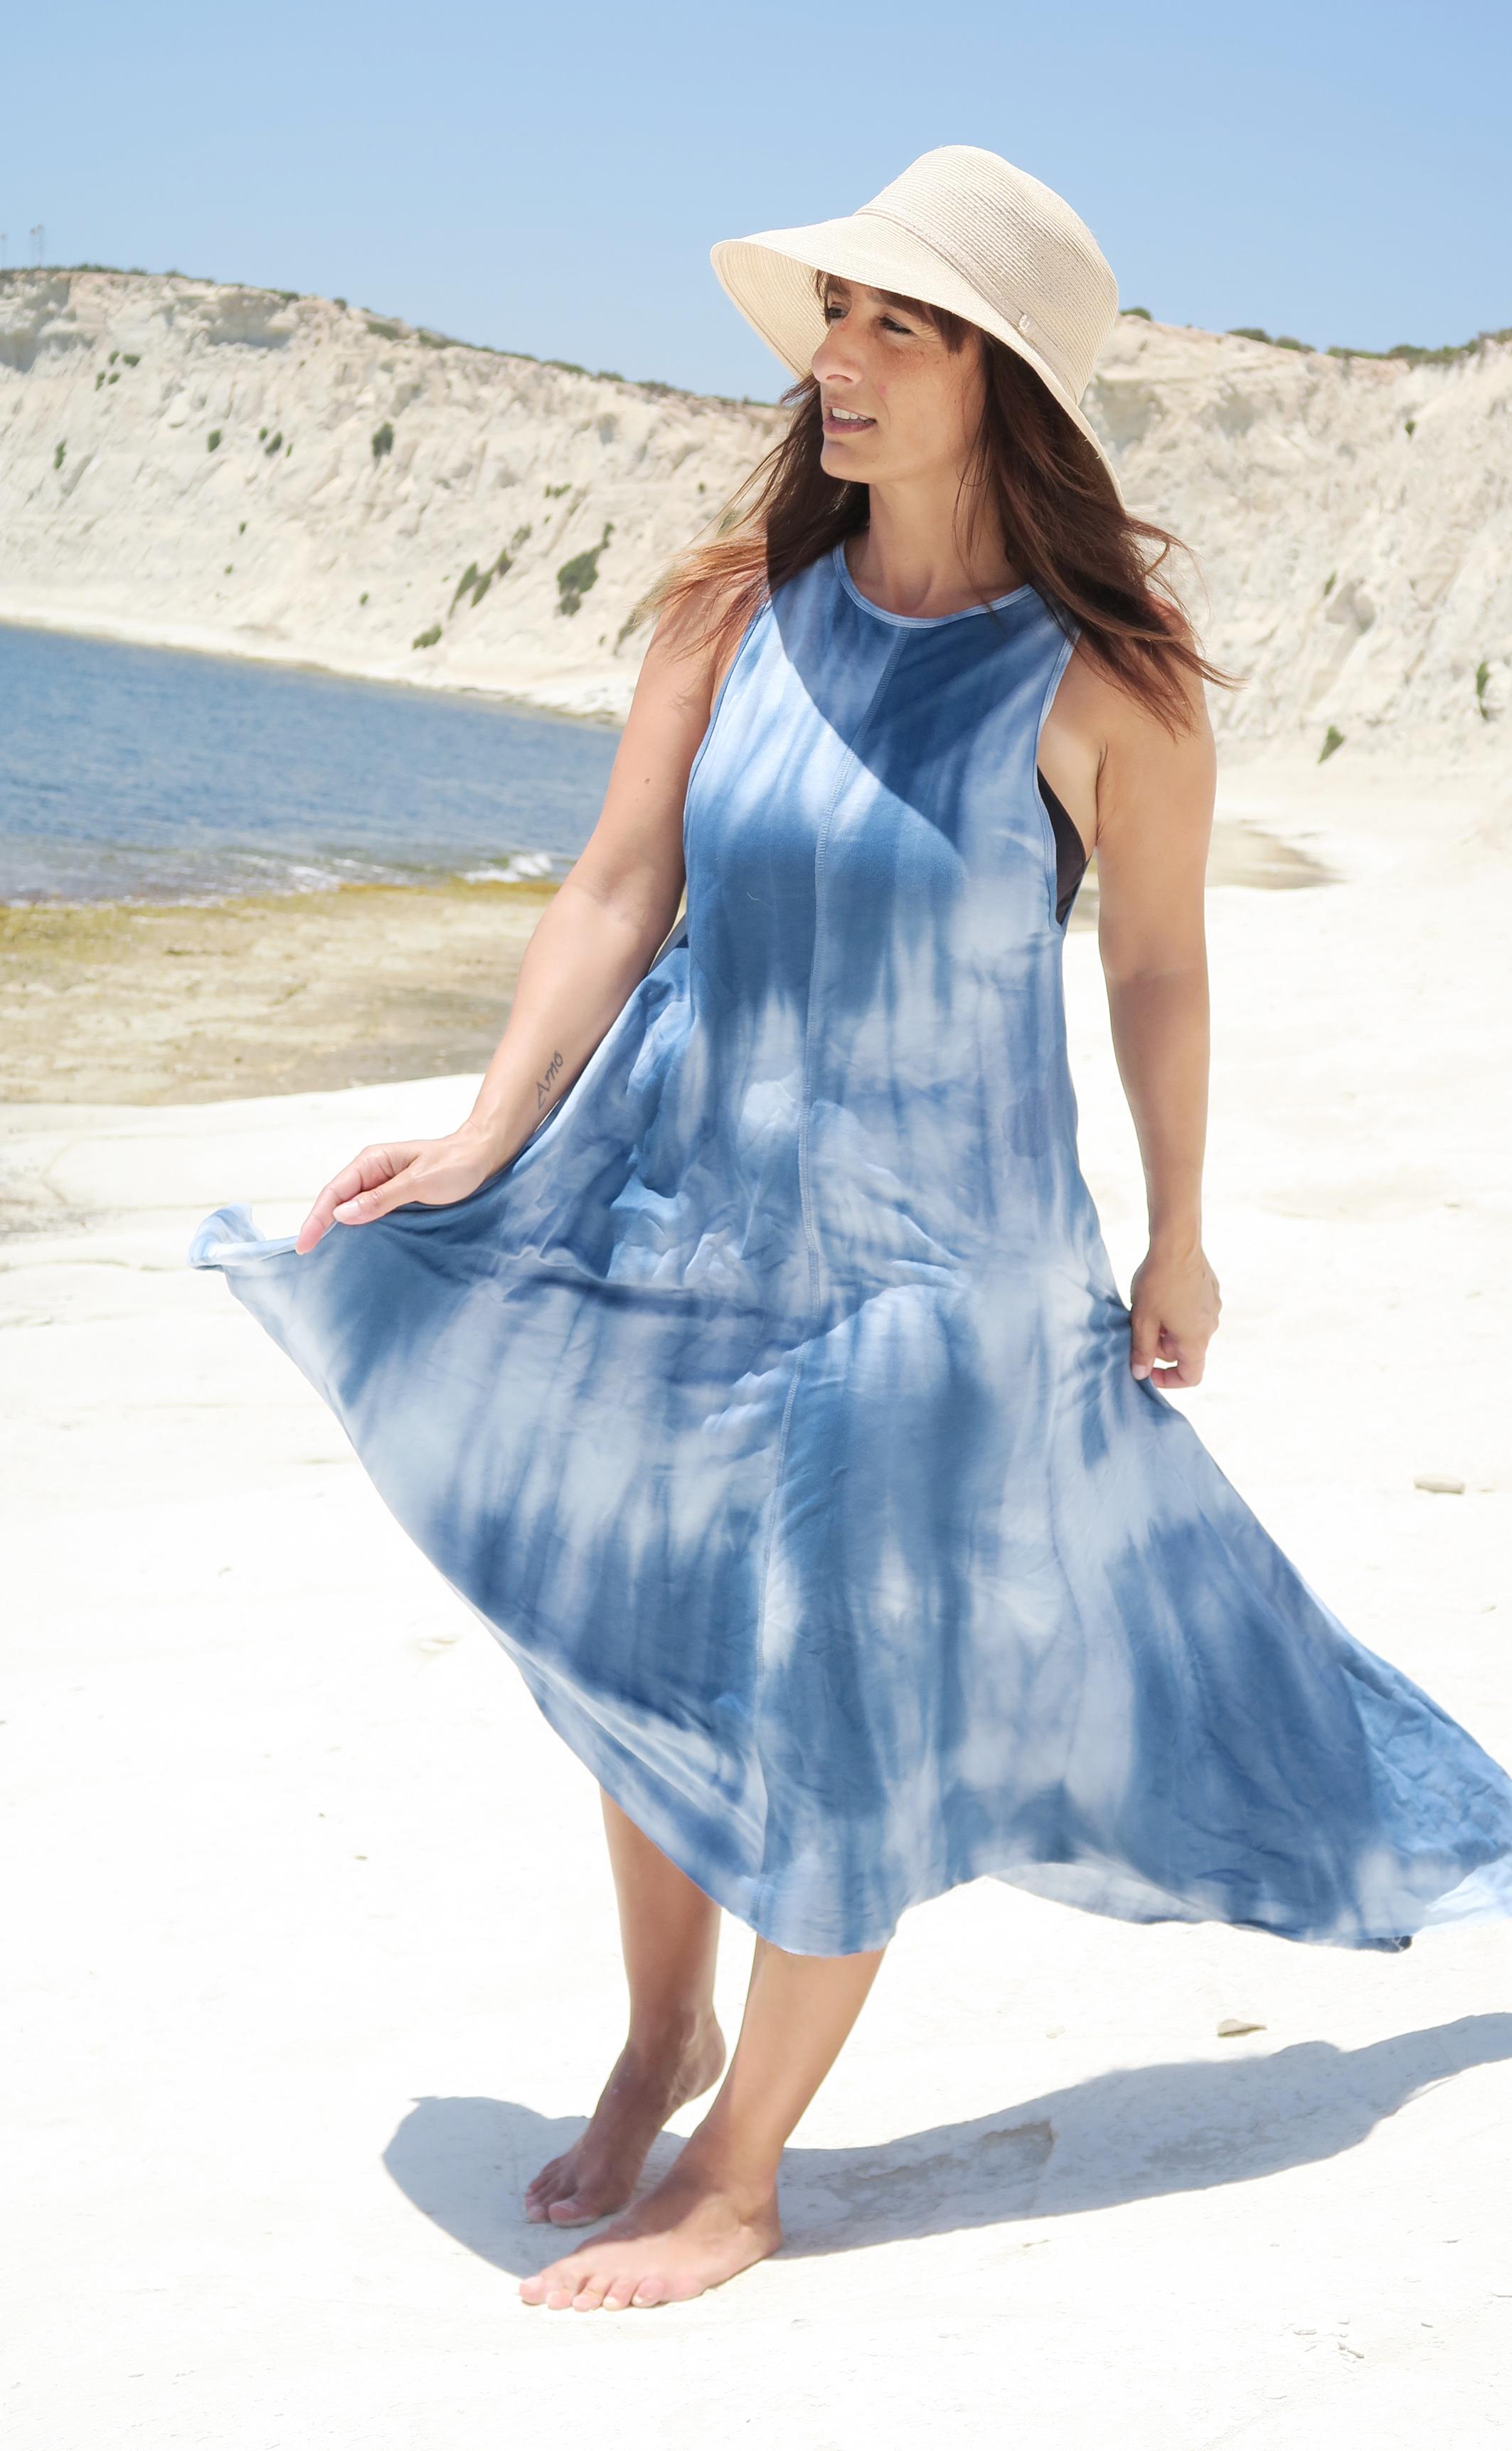 Malta-Blogger-Streetstyle-Fashion-Modeblogger-Fashionblogger-3